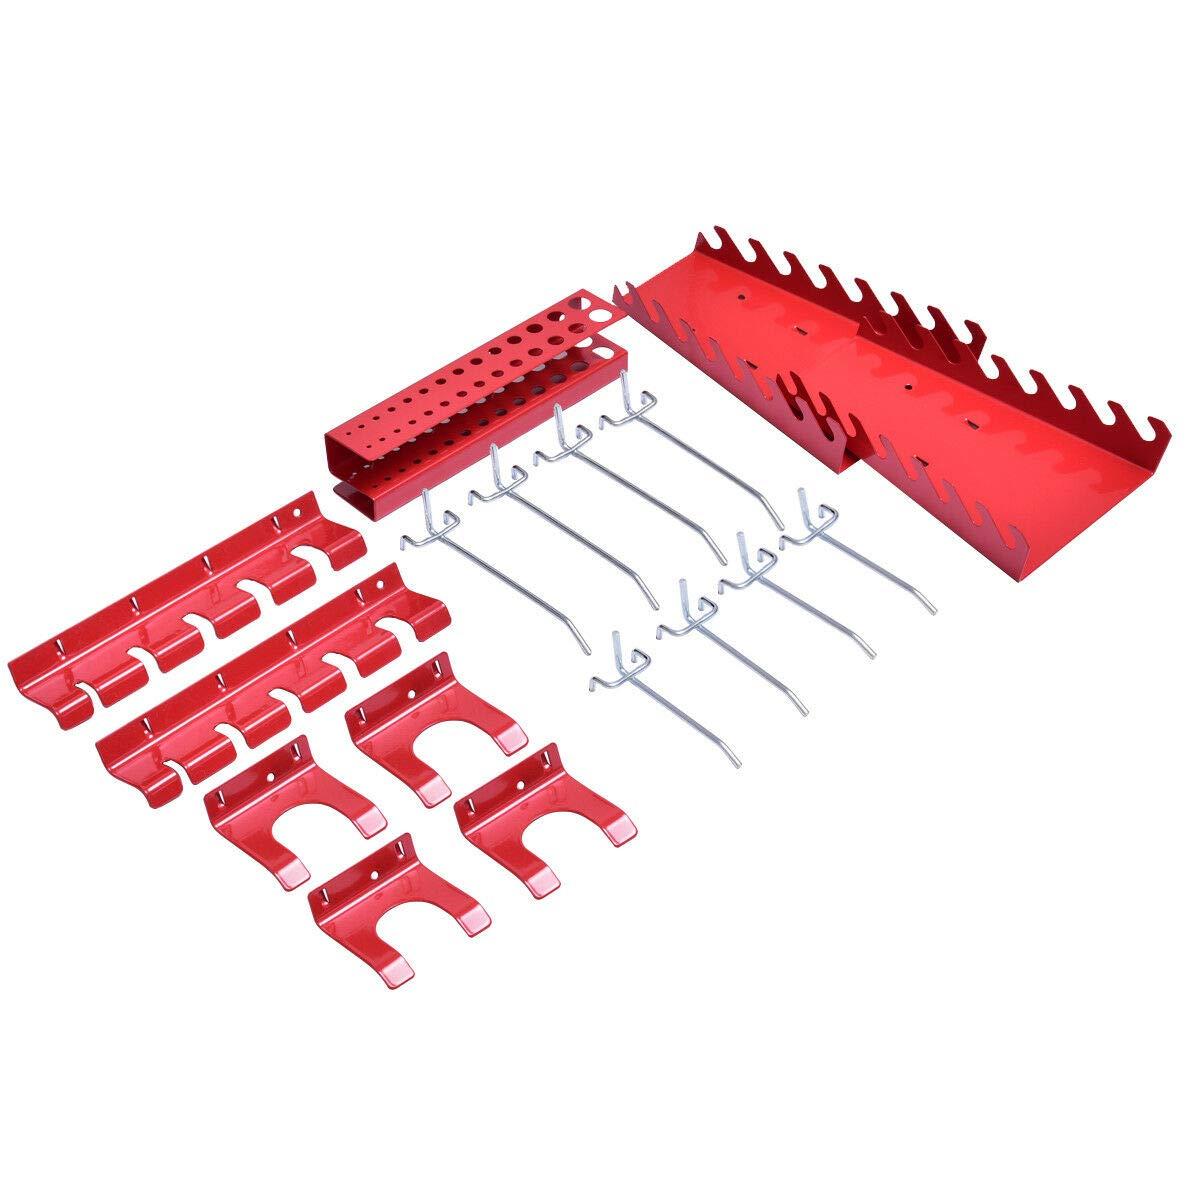 24'' x 48'' Metal Pegboard Panels Garage Tool Board Storage Organizer Holder Black by allgoodsdelight365 (Image #9)